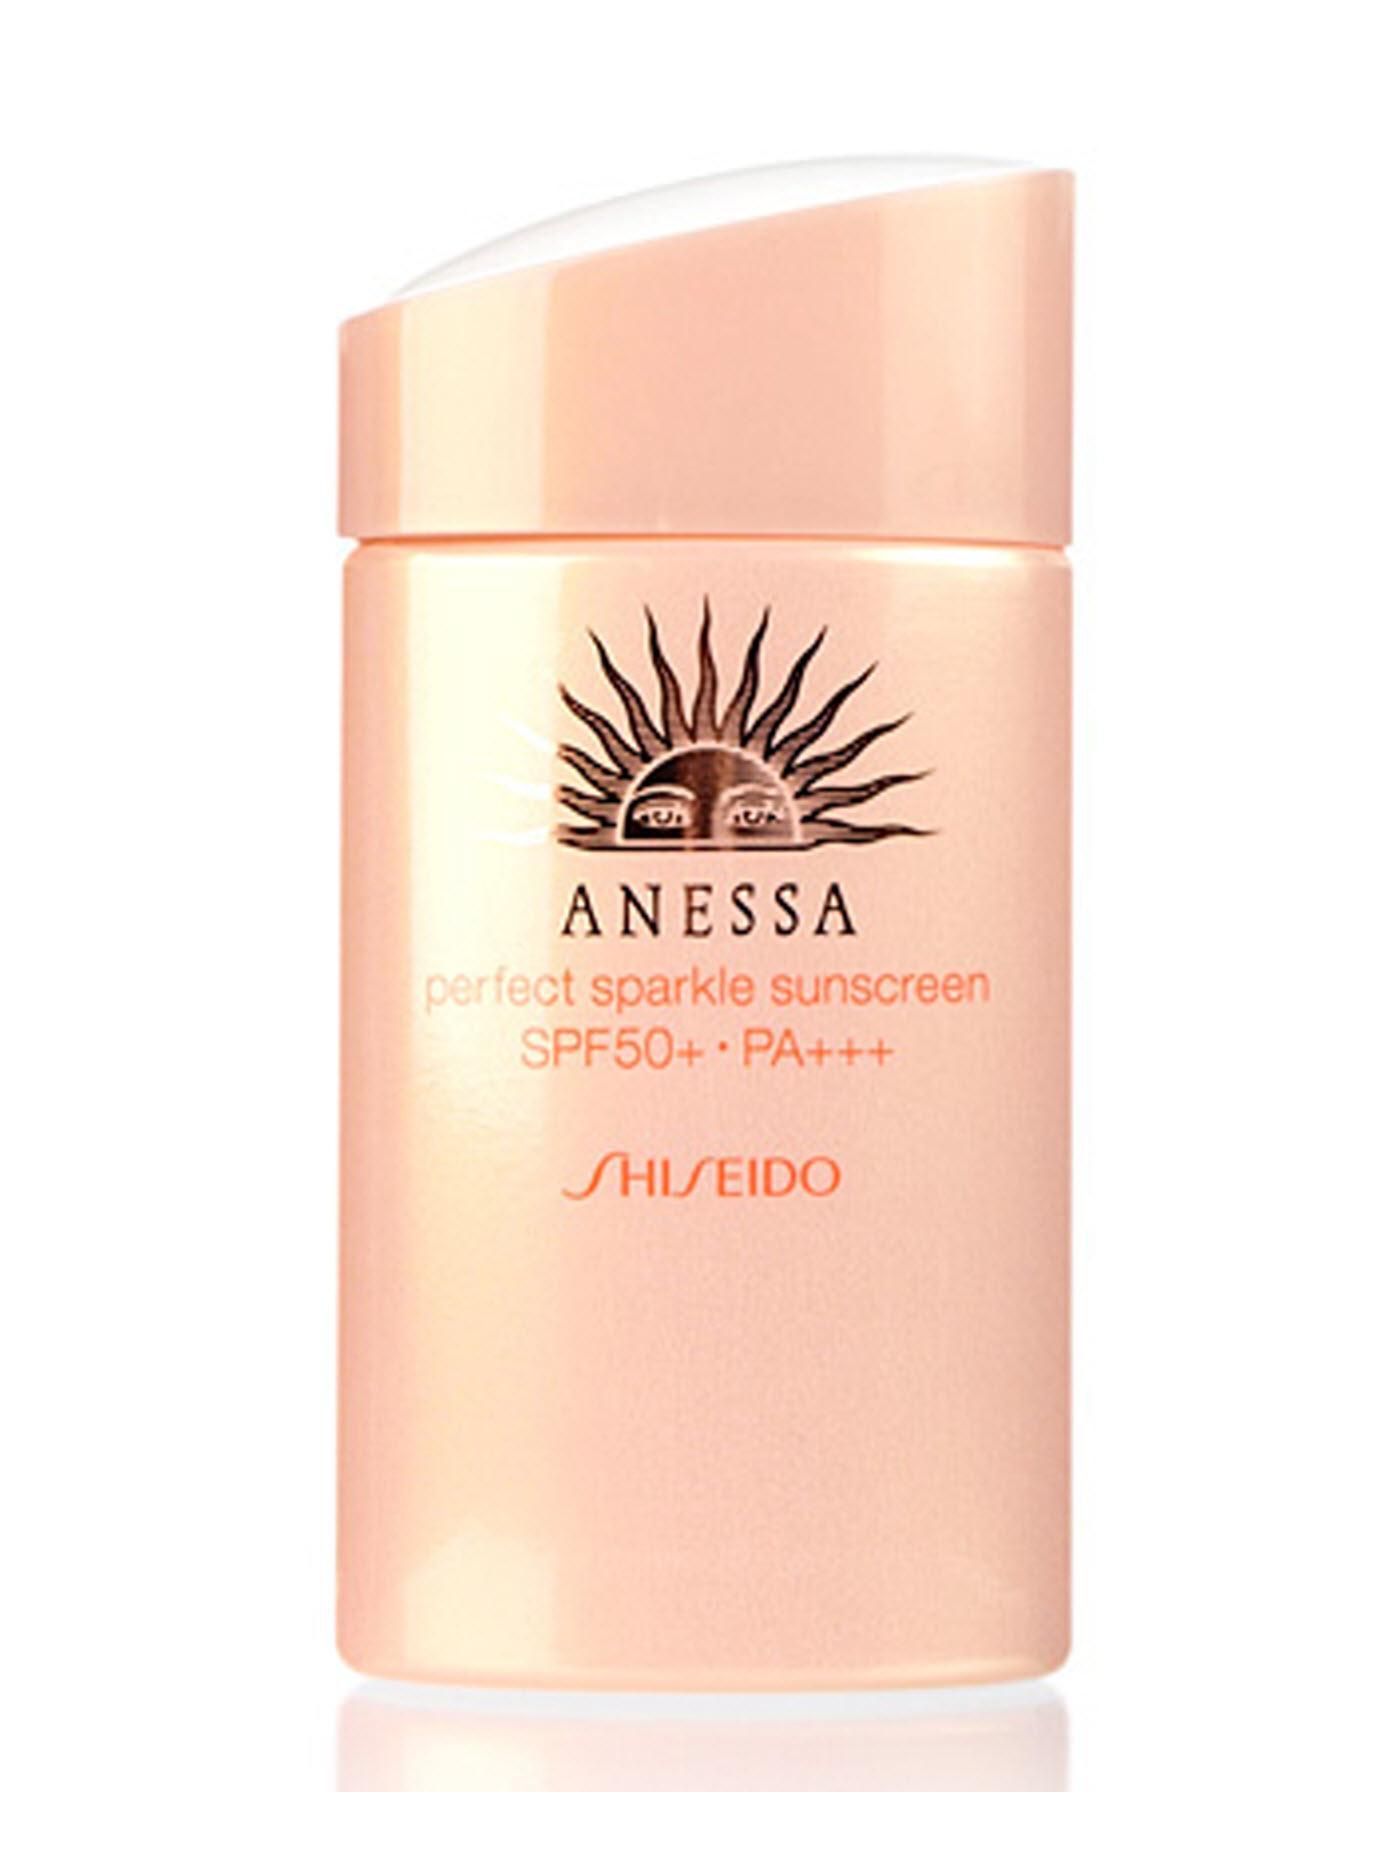 Shiseido Anessa Perfect Sparkle Sunscreen SPF50+ PA+++